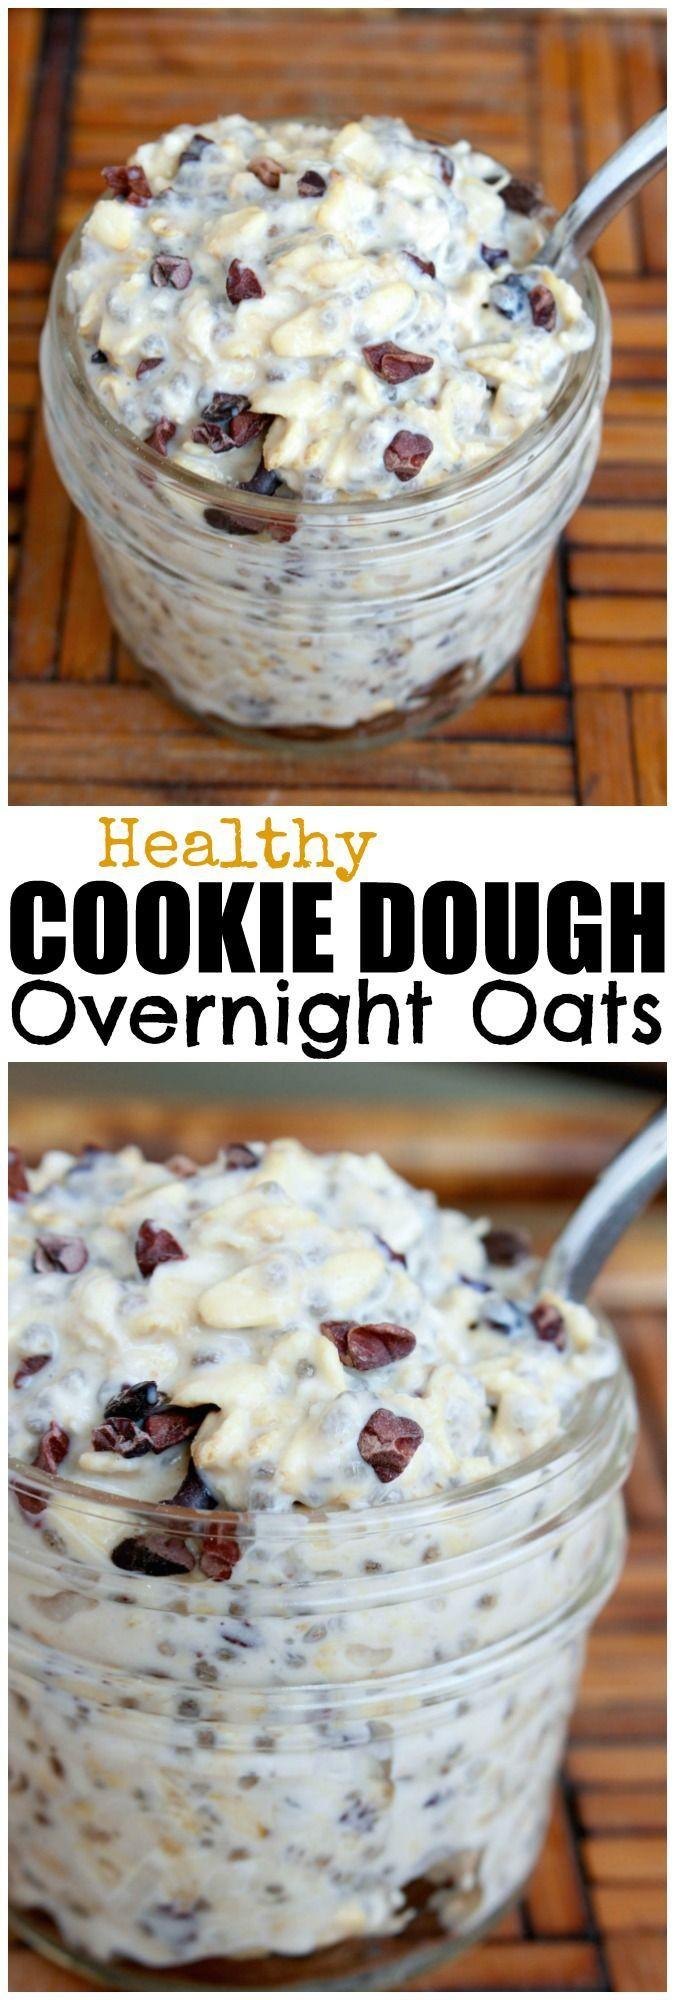 Healthy Overnight Oats  Best 25 Healthy overnight oats ideas on Pinterest